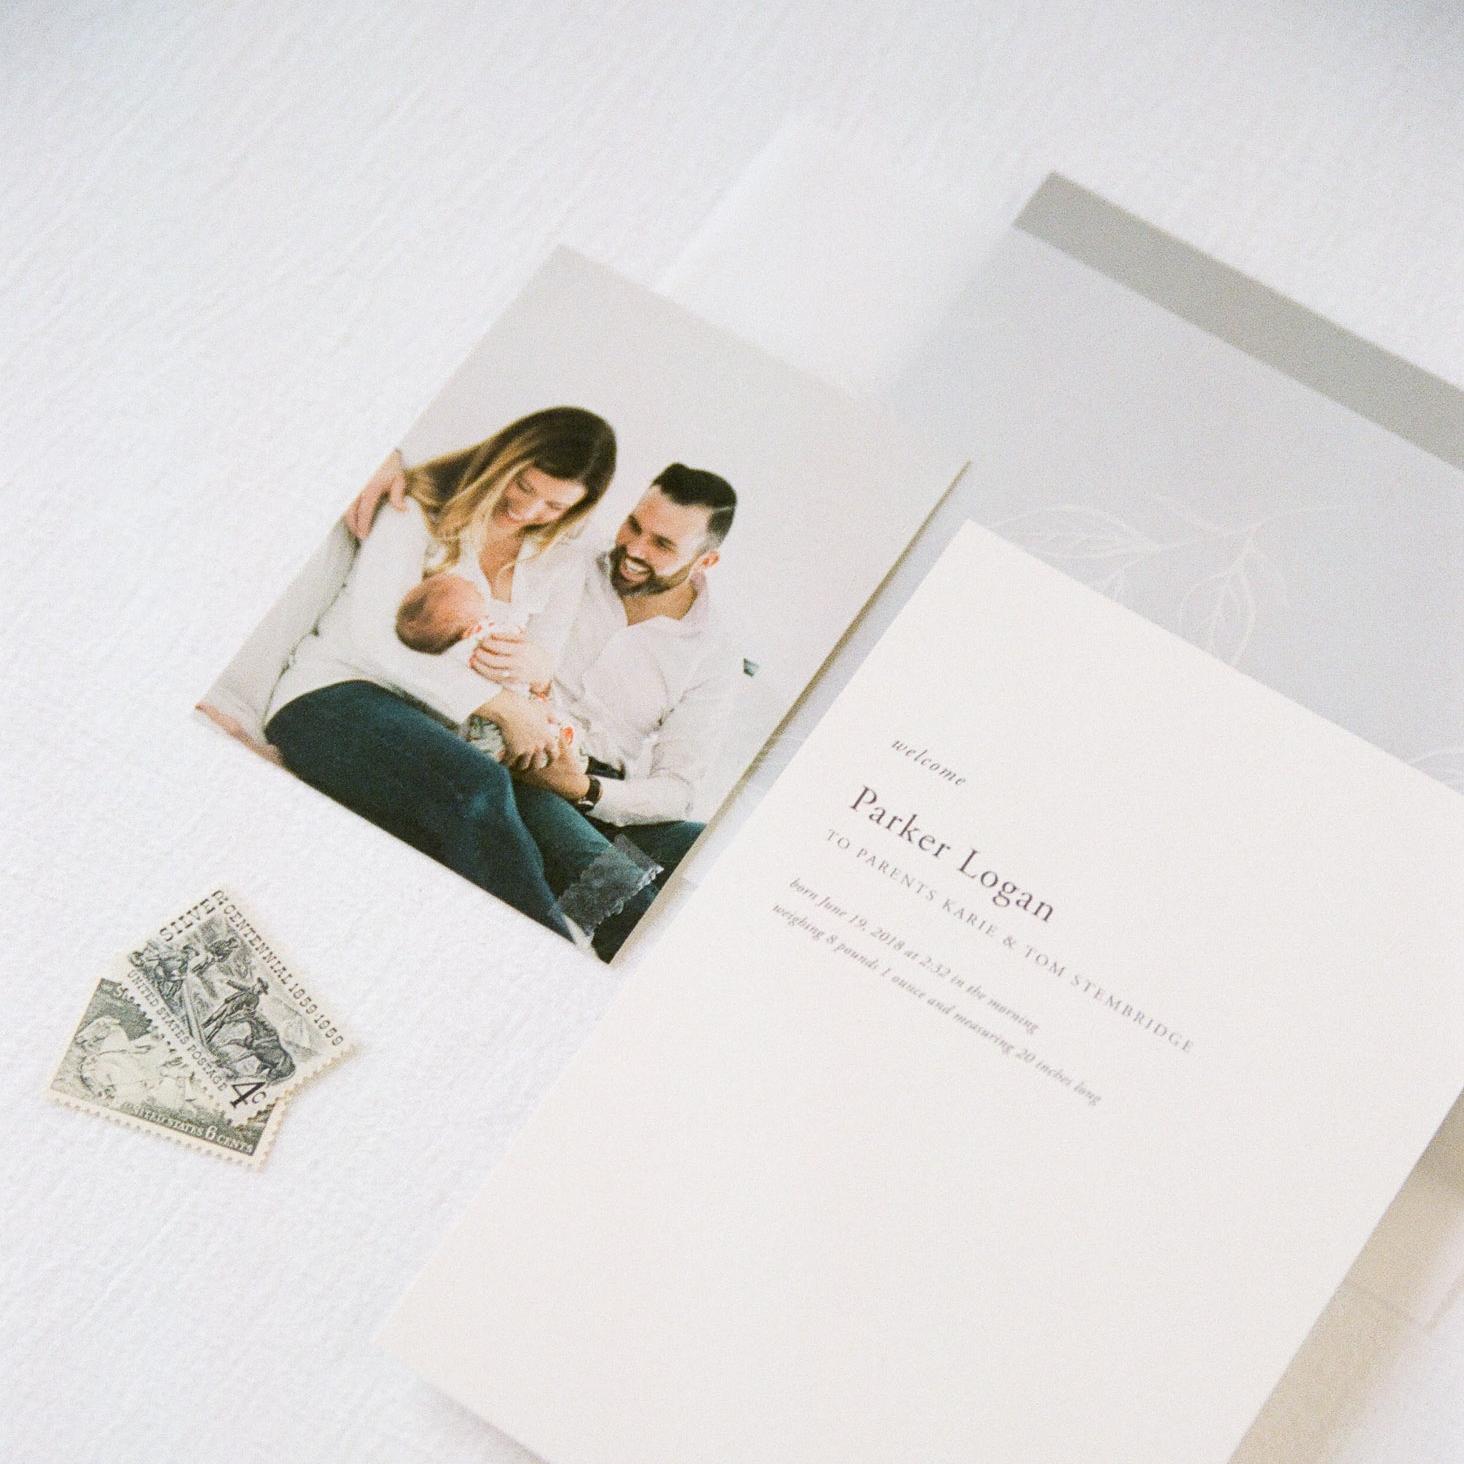 coeo-print-company-collection-film-37.jpg